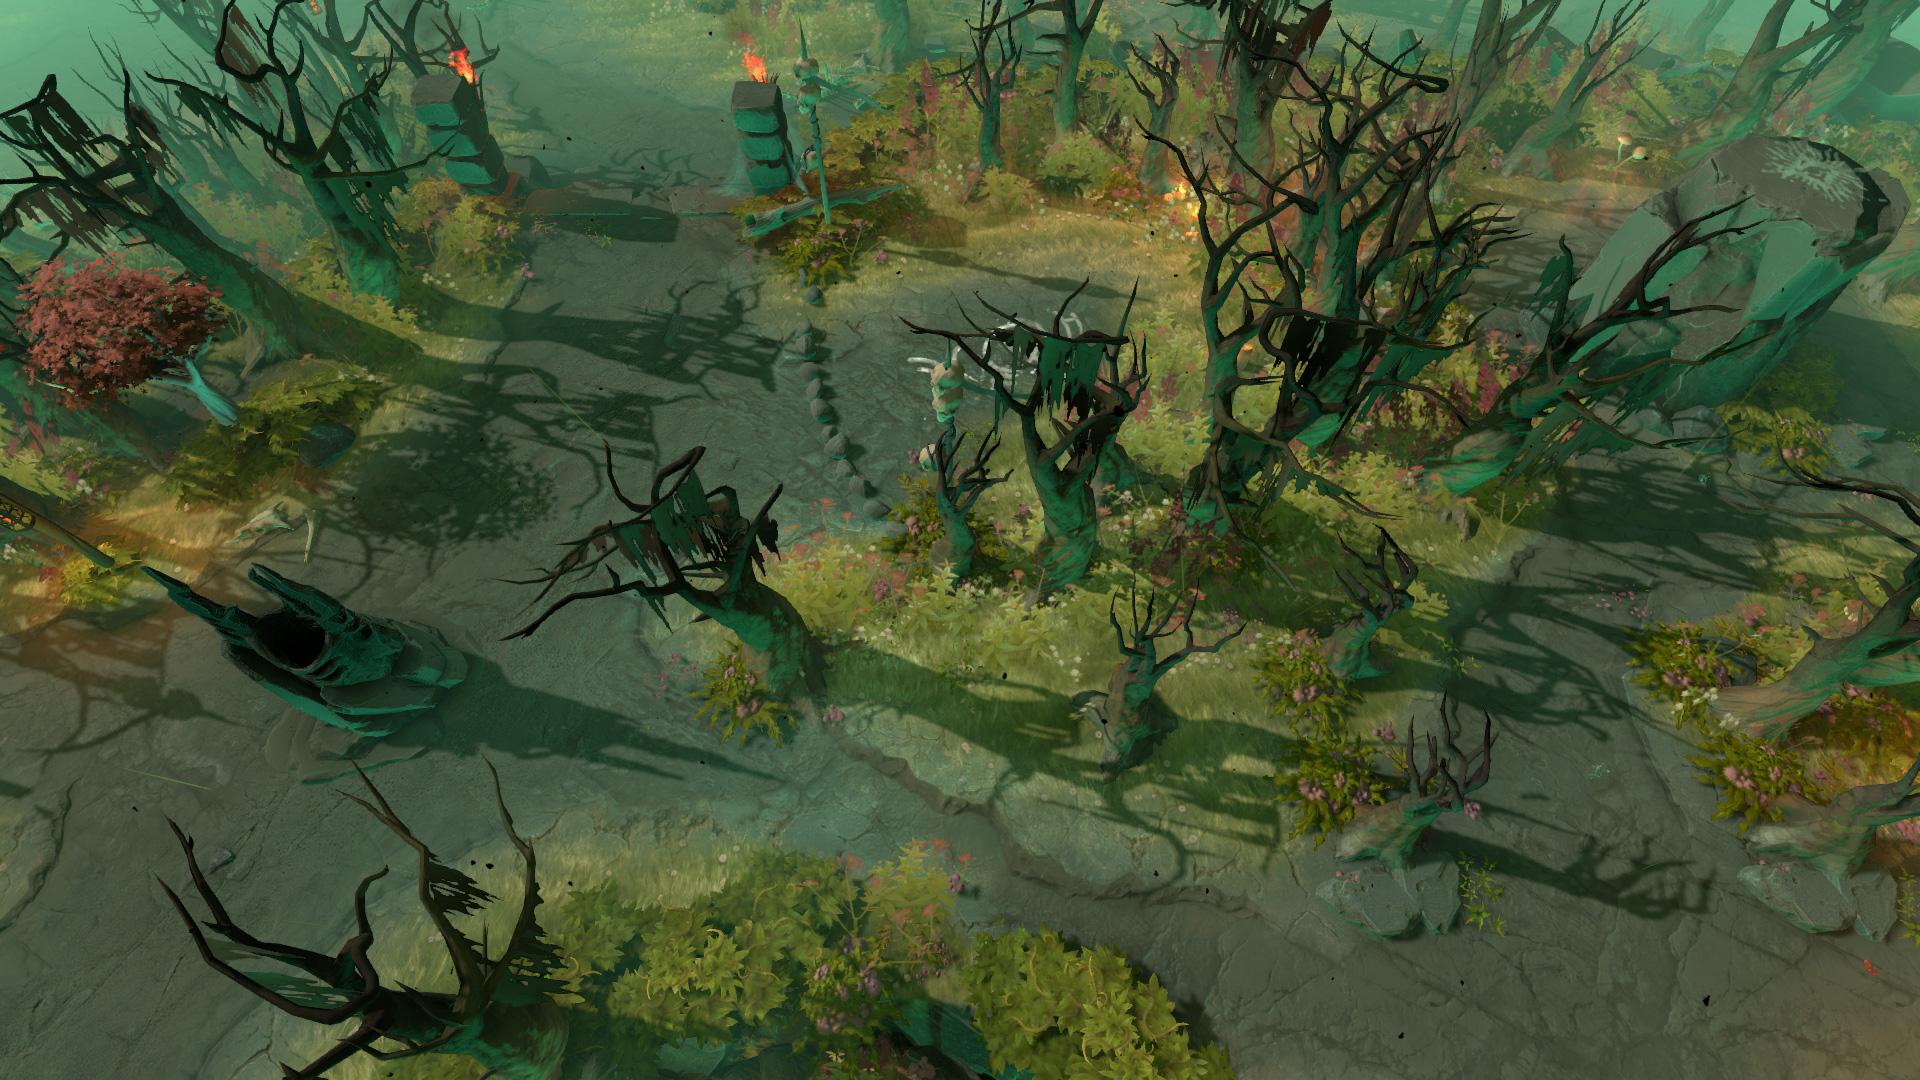 Summer Terrain Weather Pestilence Preview 3.jpg